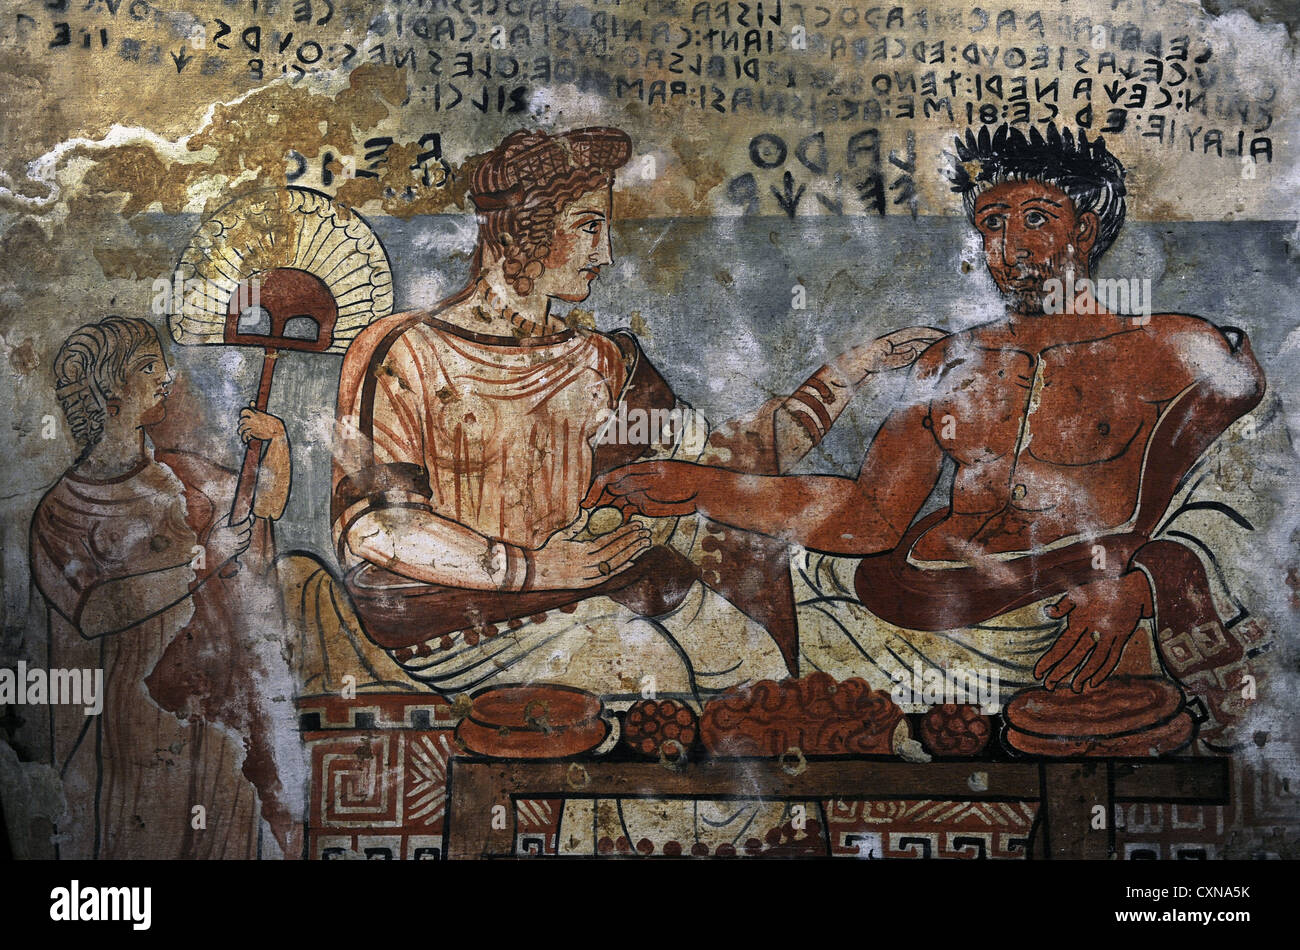 Etruscan Art. Tomb of the Shields. Tarquinia. Larth Velcha and his wife, Velia Seitithi. Copy. Ny Carlsberg Glyptotek. - Stock Image